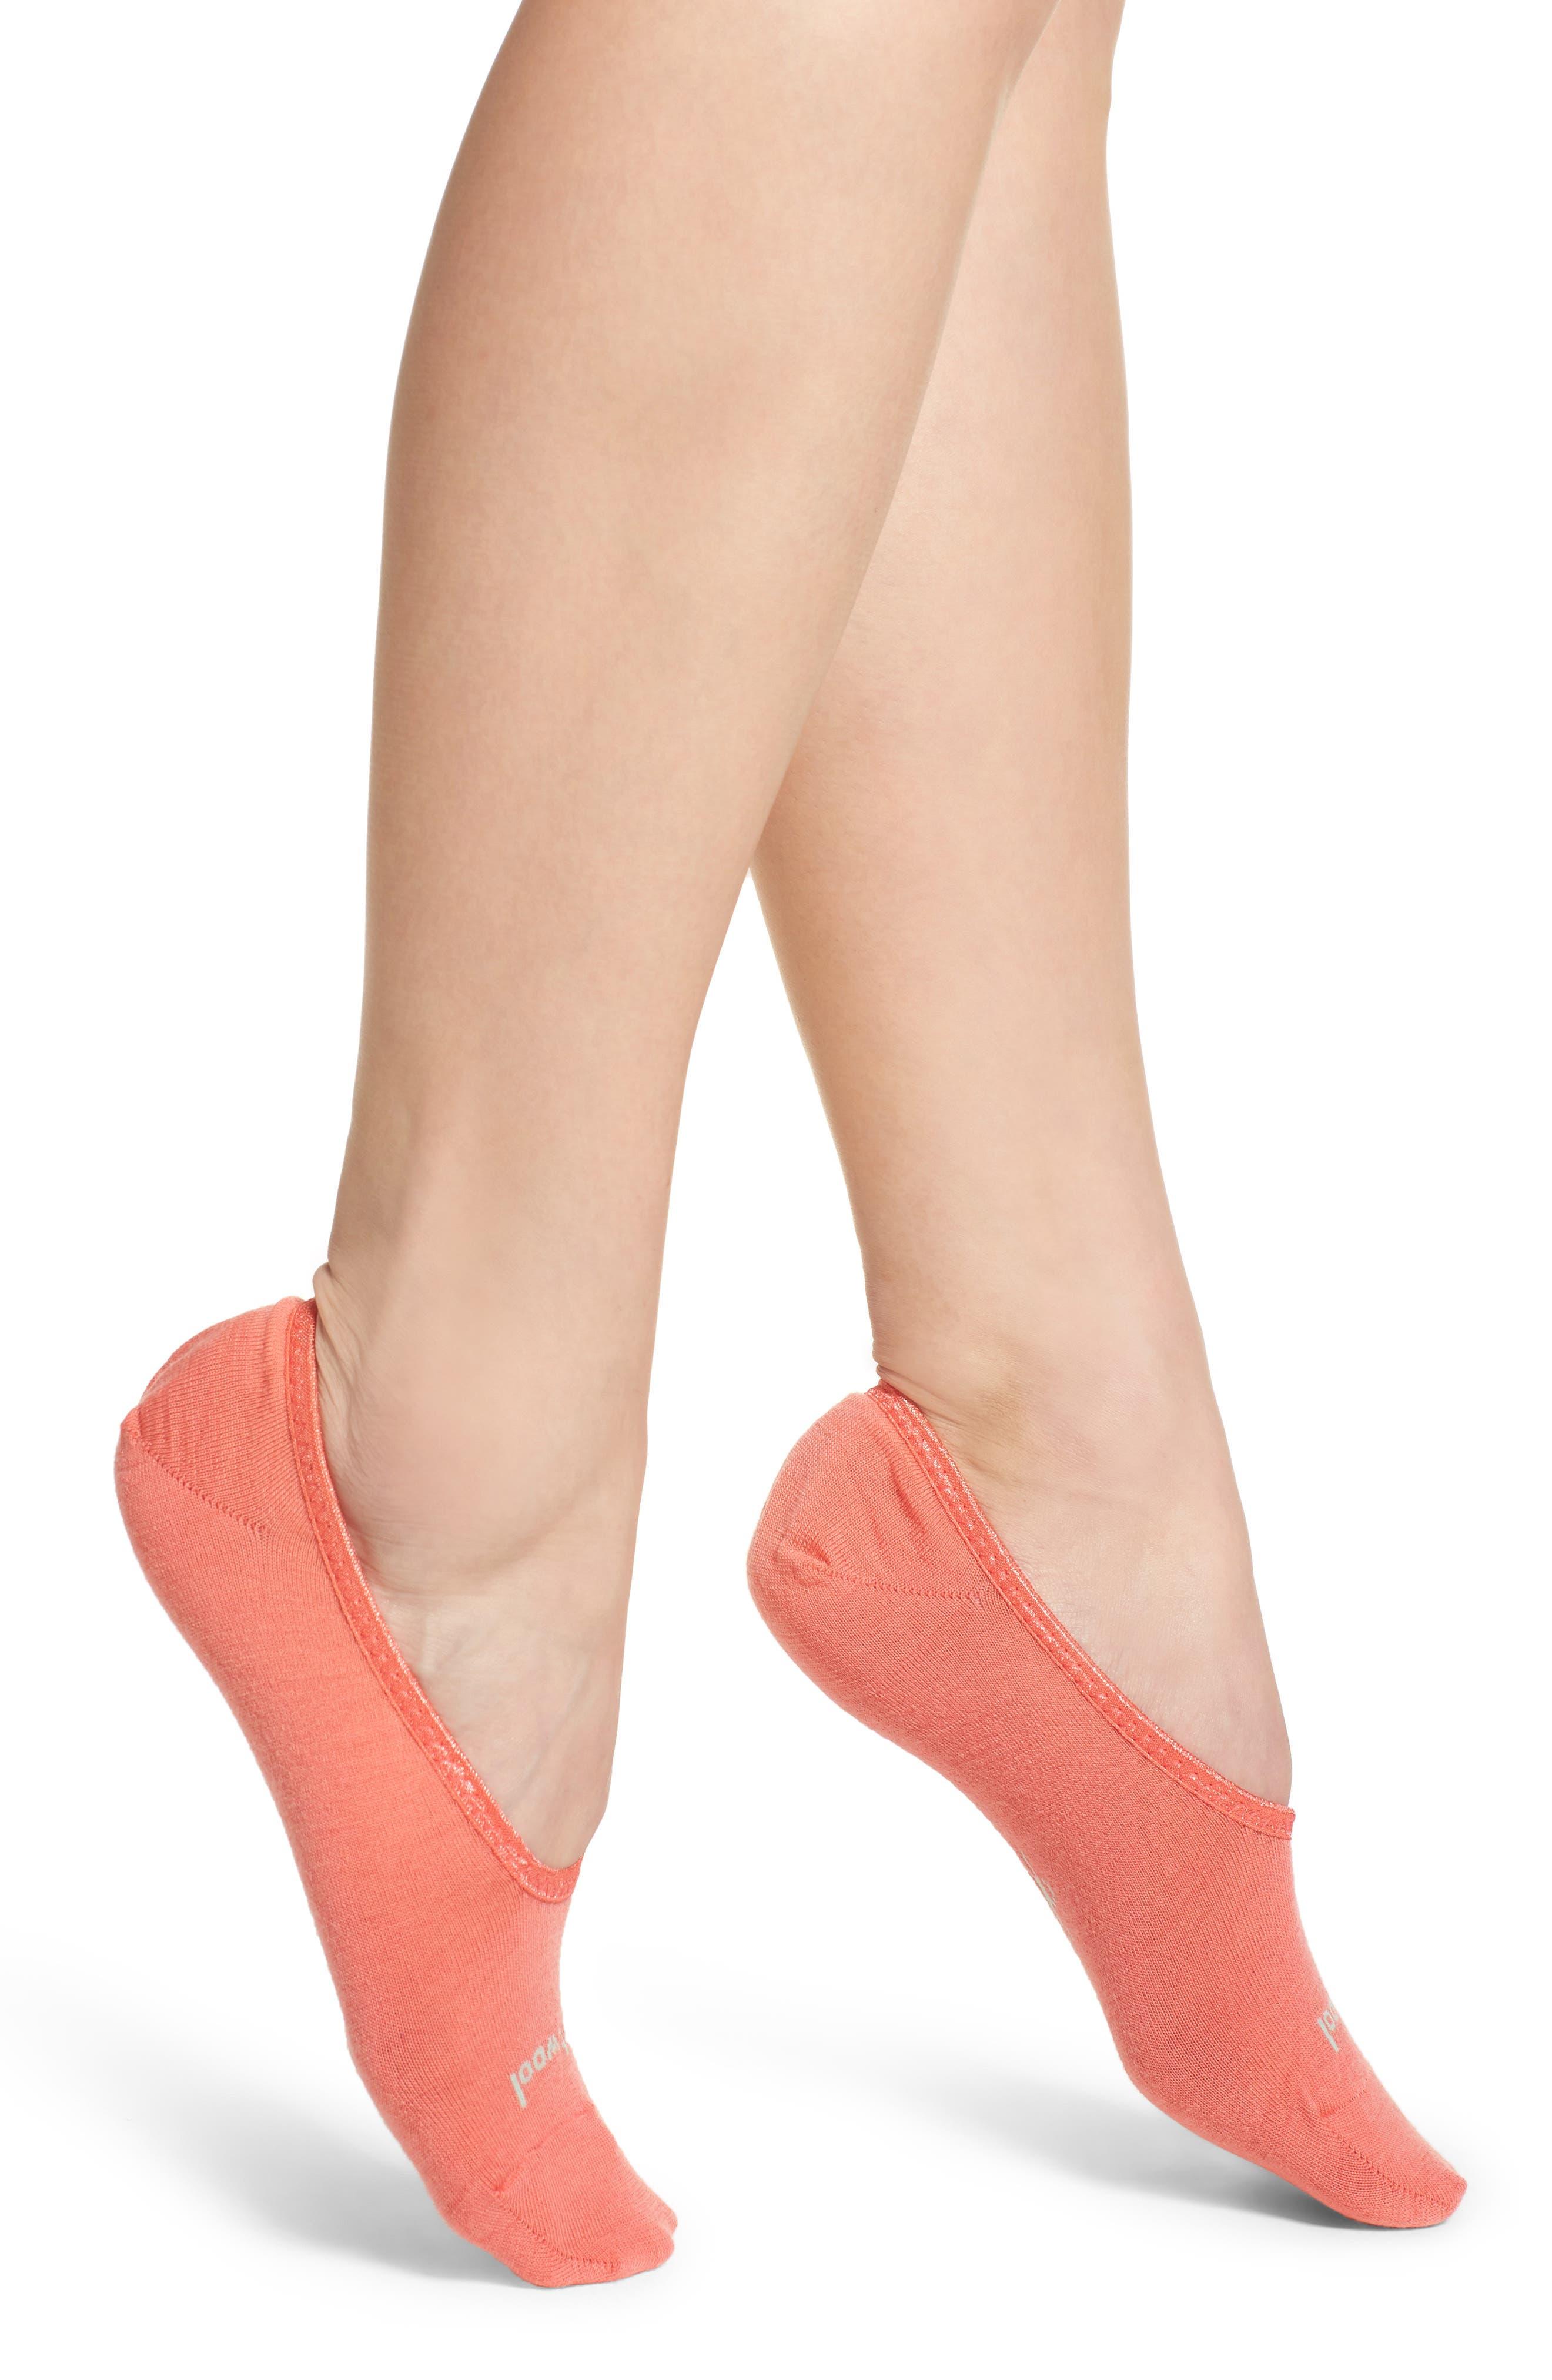 Hide & Seek No-Show Socks,                             Main thumbnail 1, color,                             Bright Coral